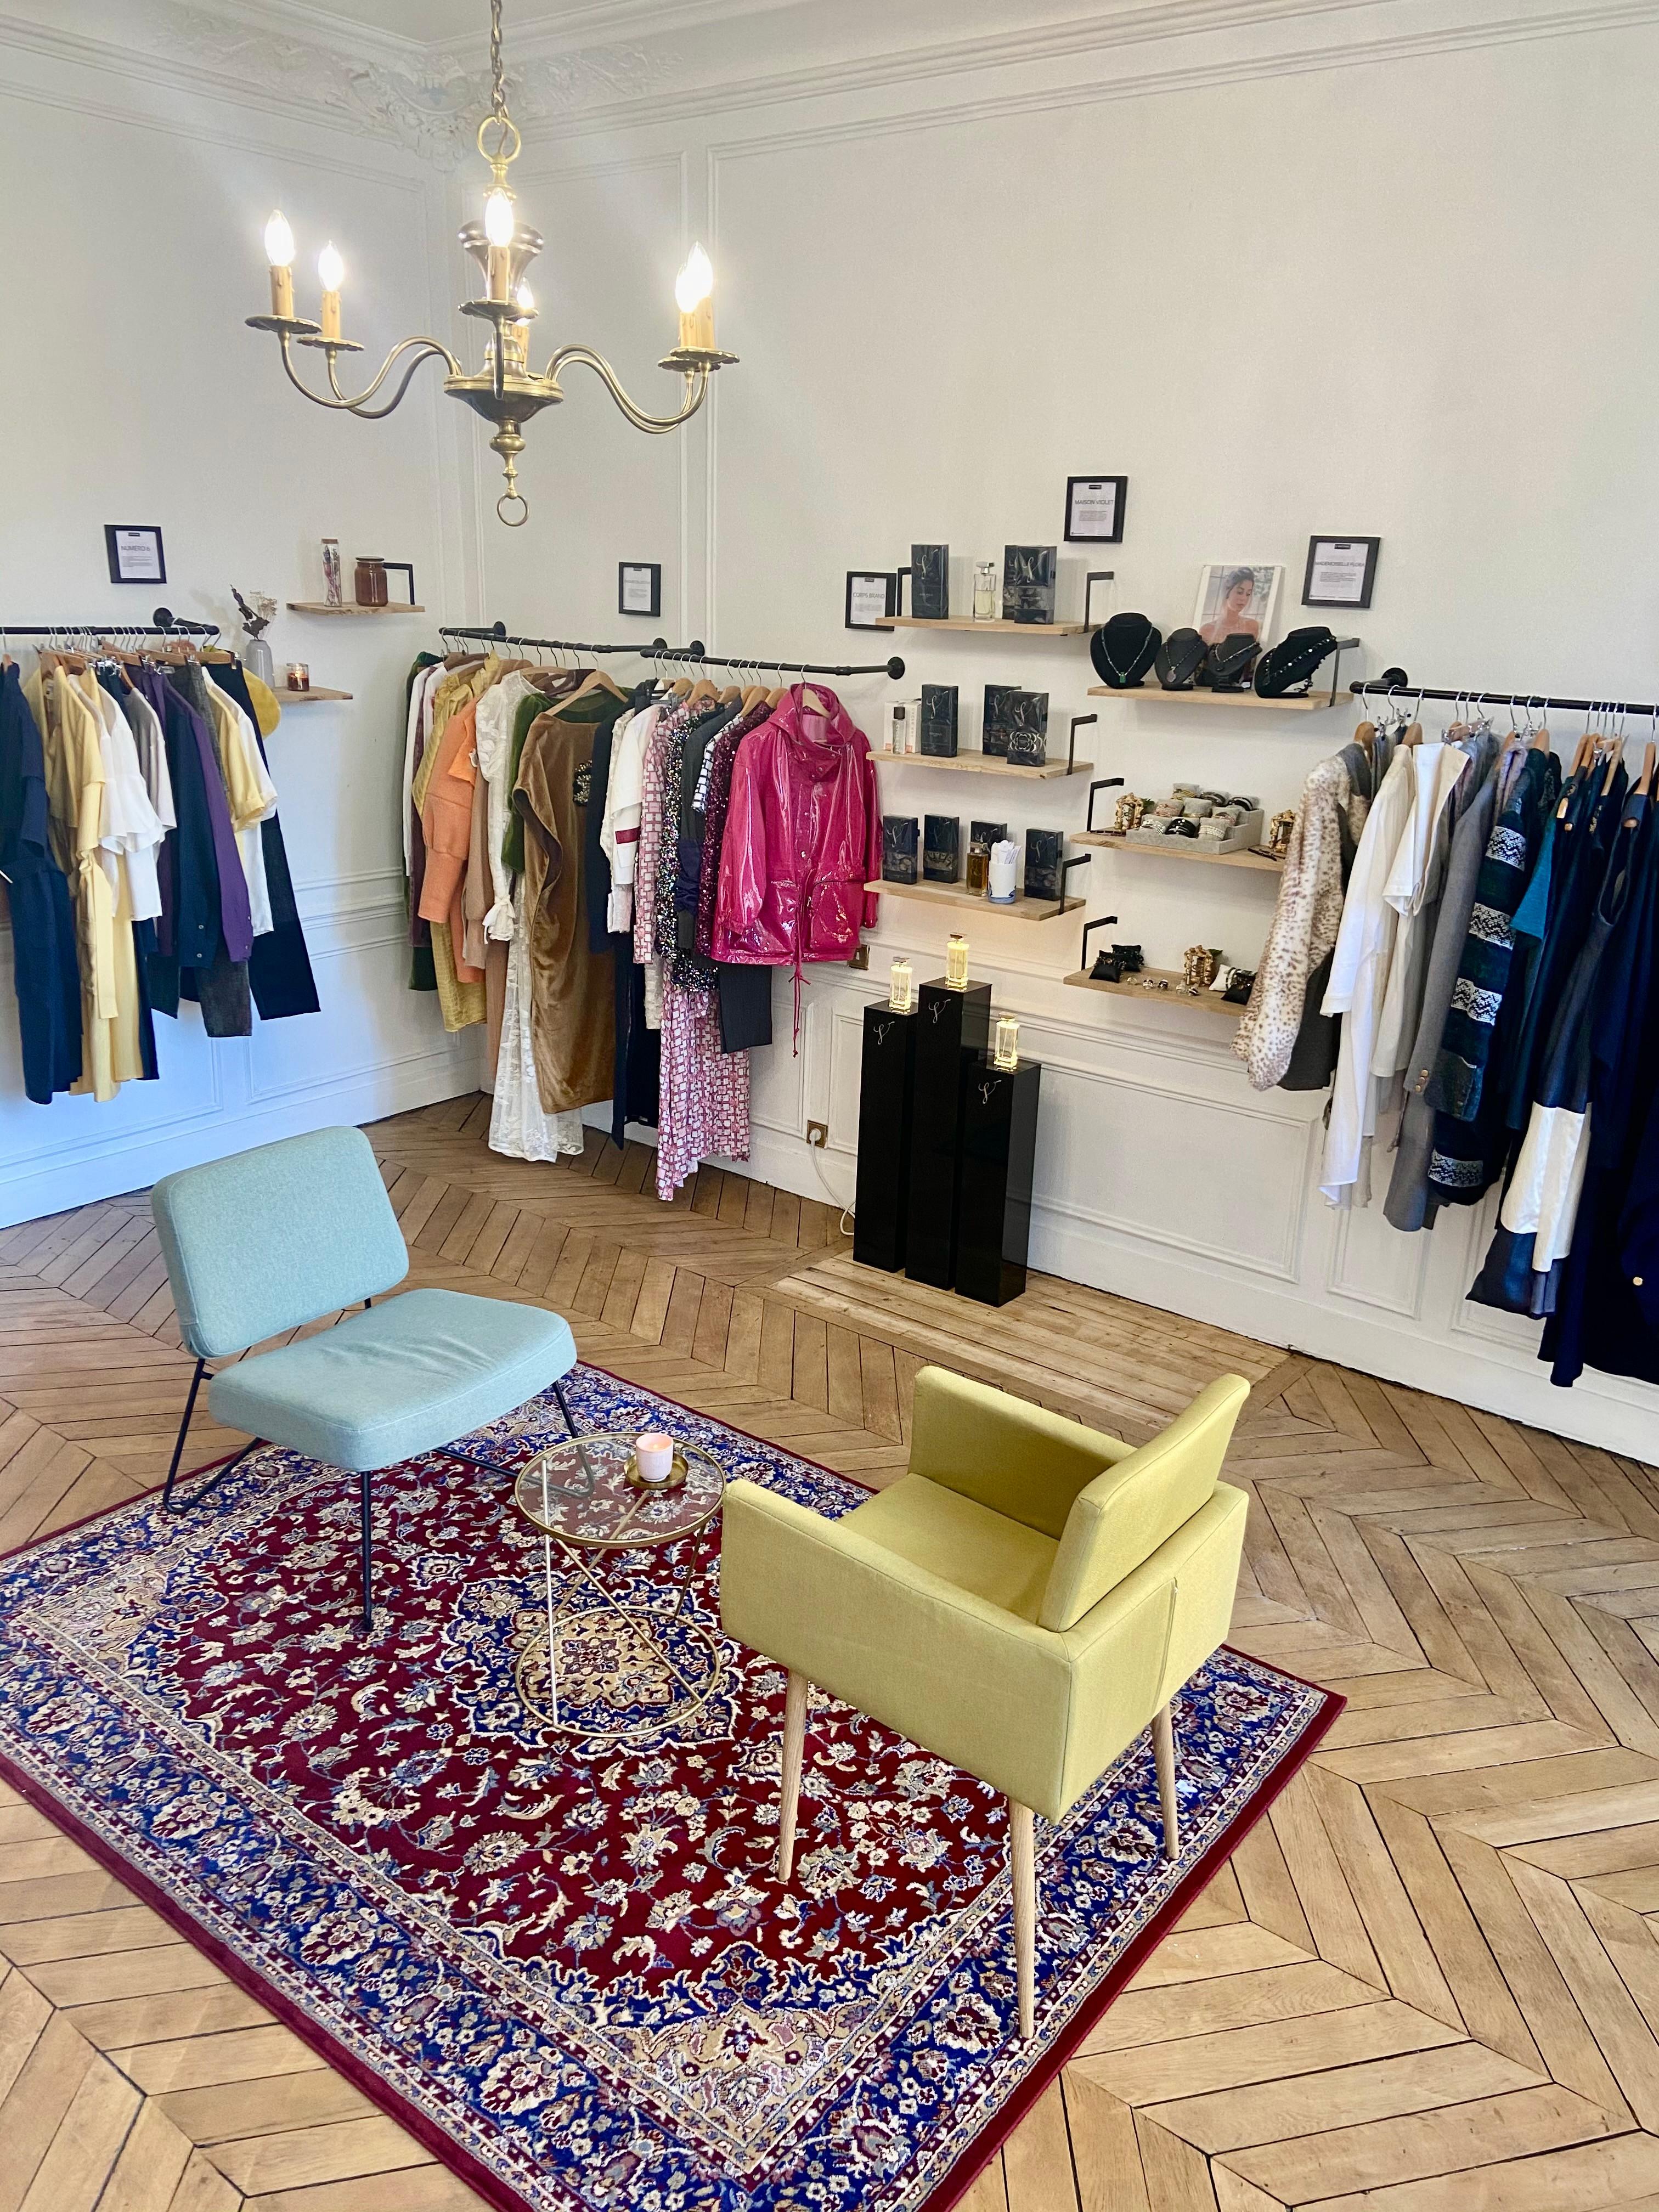 Corner marque showroom : un portant